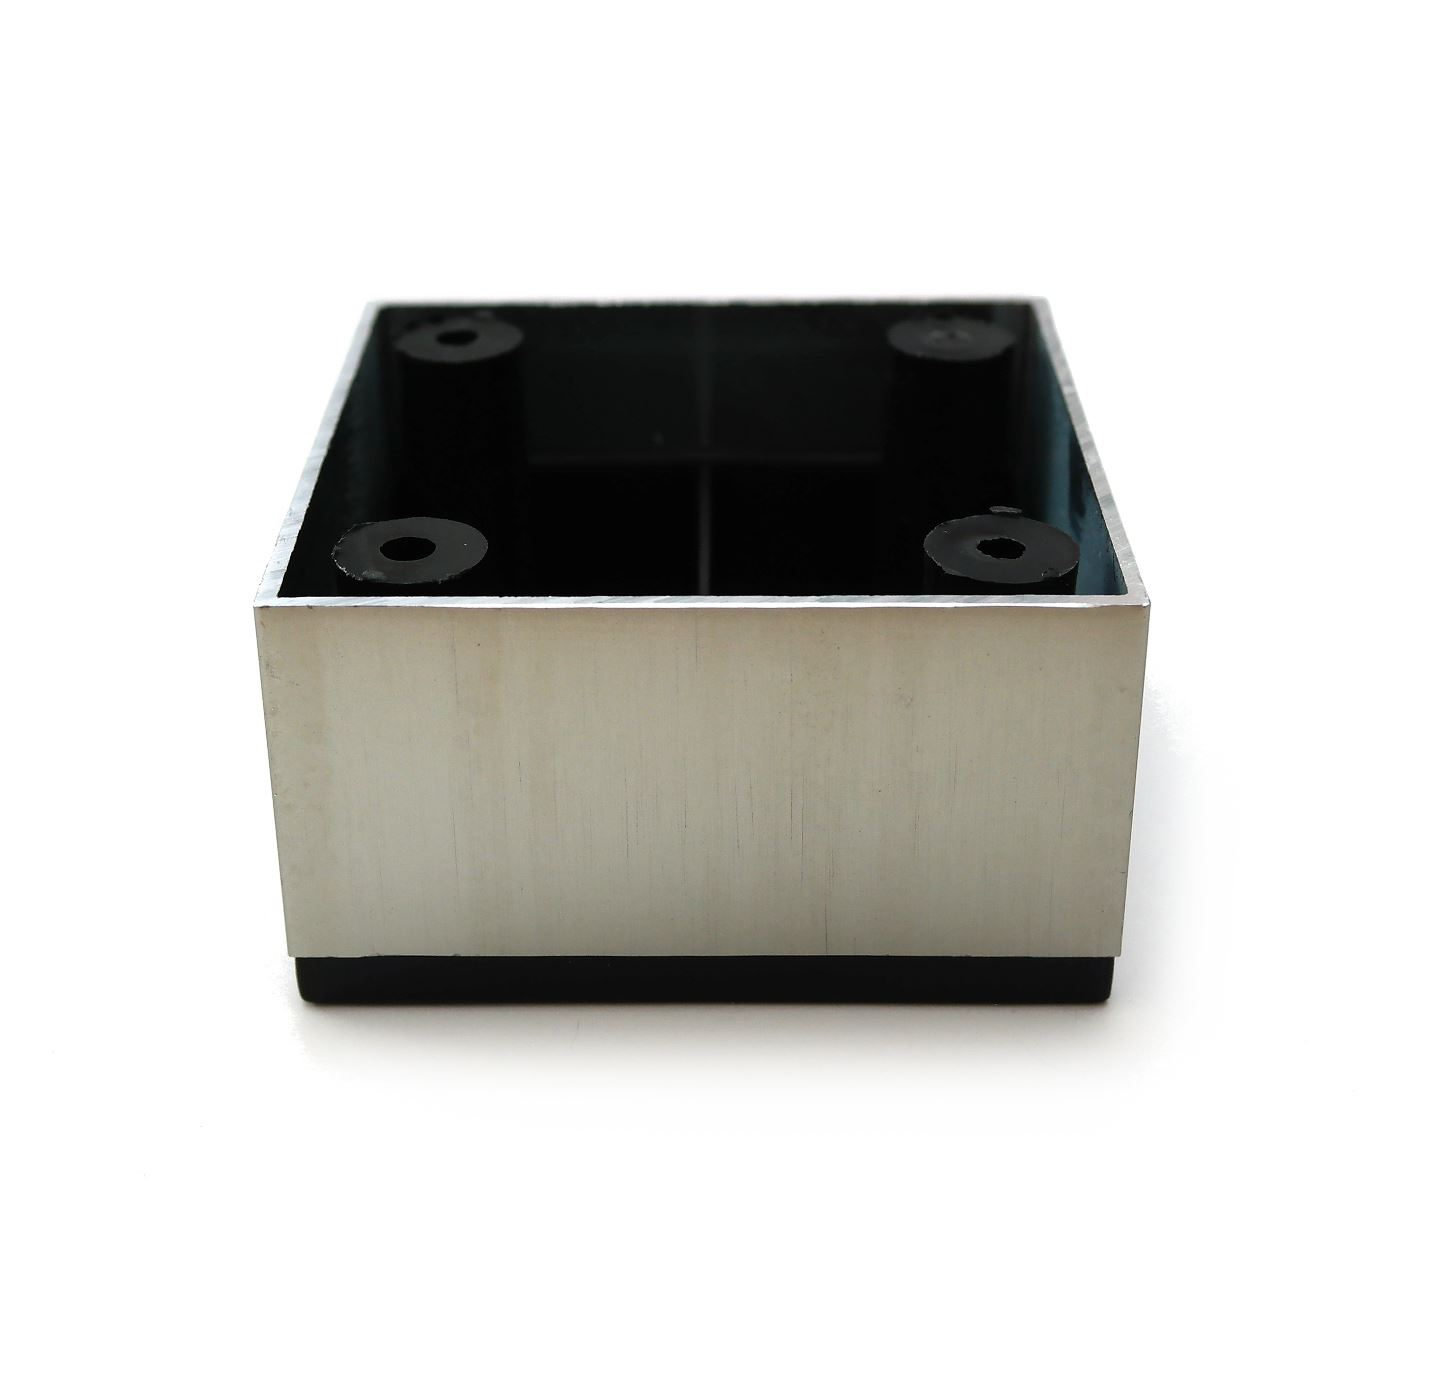 aluminium f e beine schr nke schlafsofa k che m bel chrom 25mm 35mm ebay. Black Bedroom Furniture Sets. Home Design Ideas